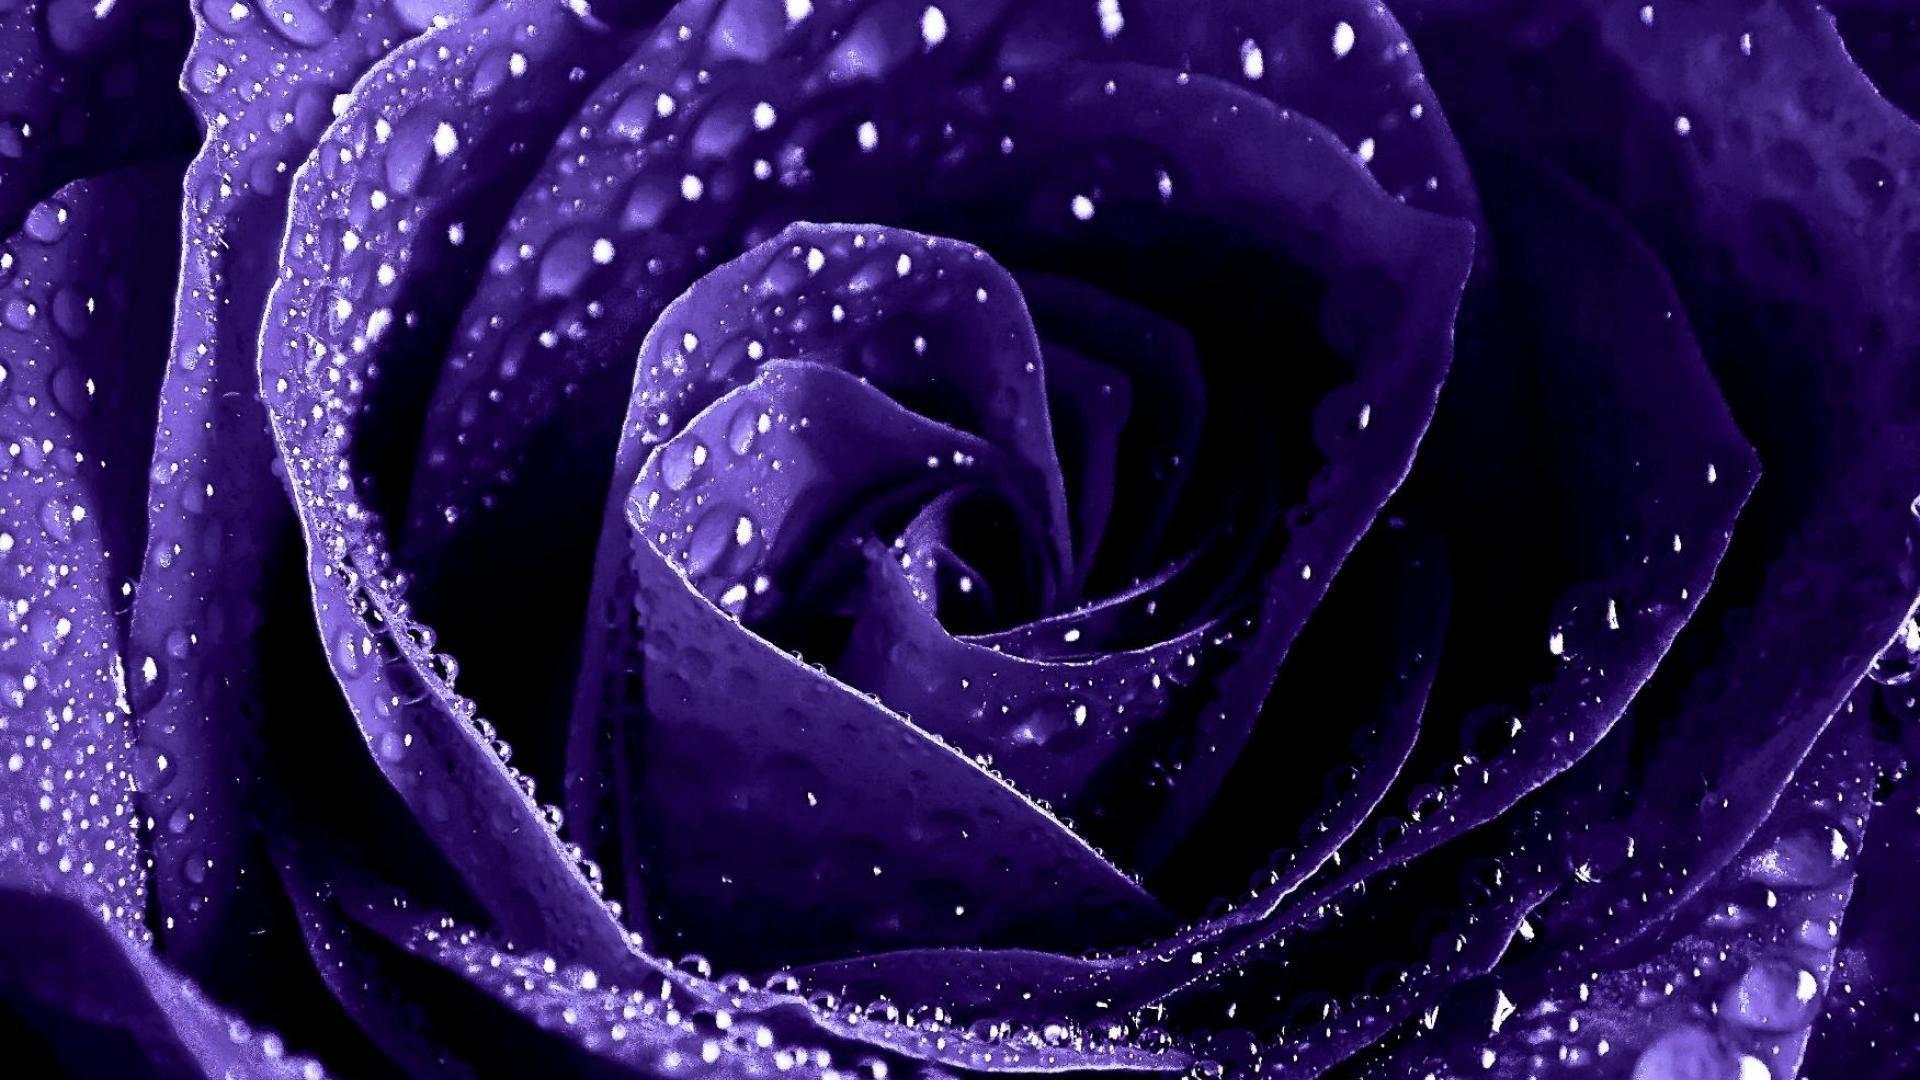 Res: 1920x1080, Purple Rose HD Wallpaper | Hintergrund |  | ID:694820 - Wallpaper  Abyss